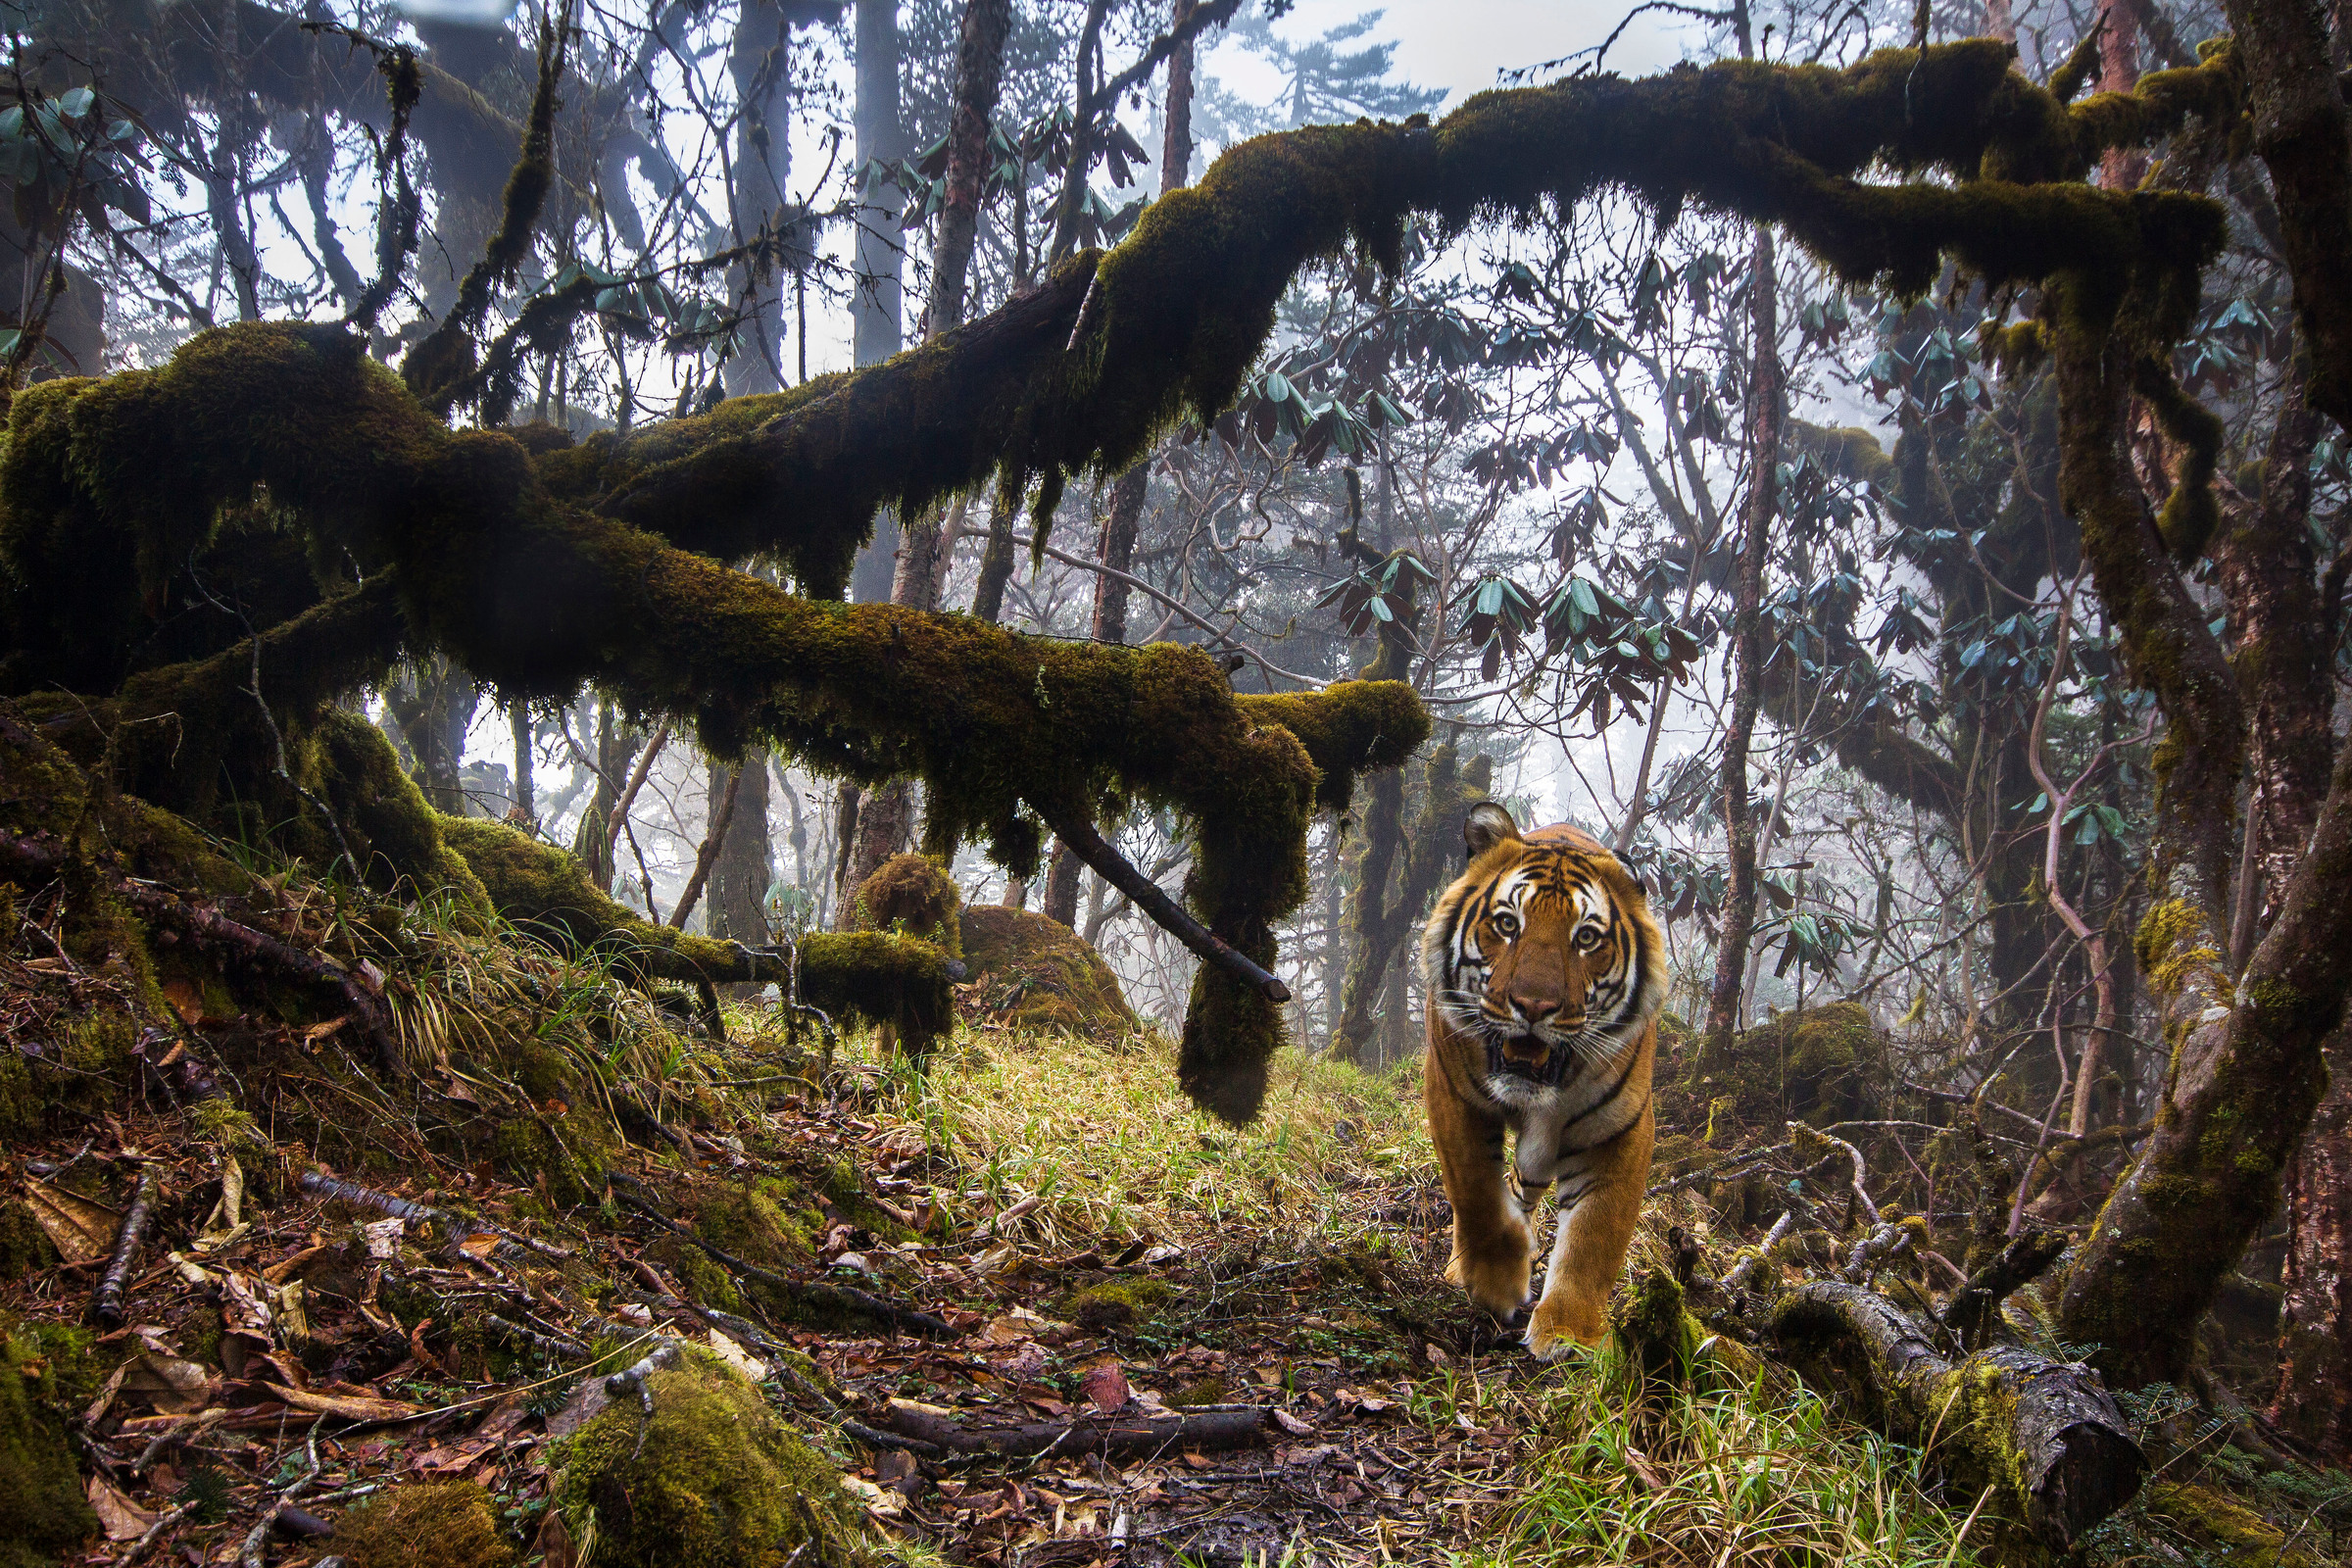 Bengaltiger im Tropenwald